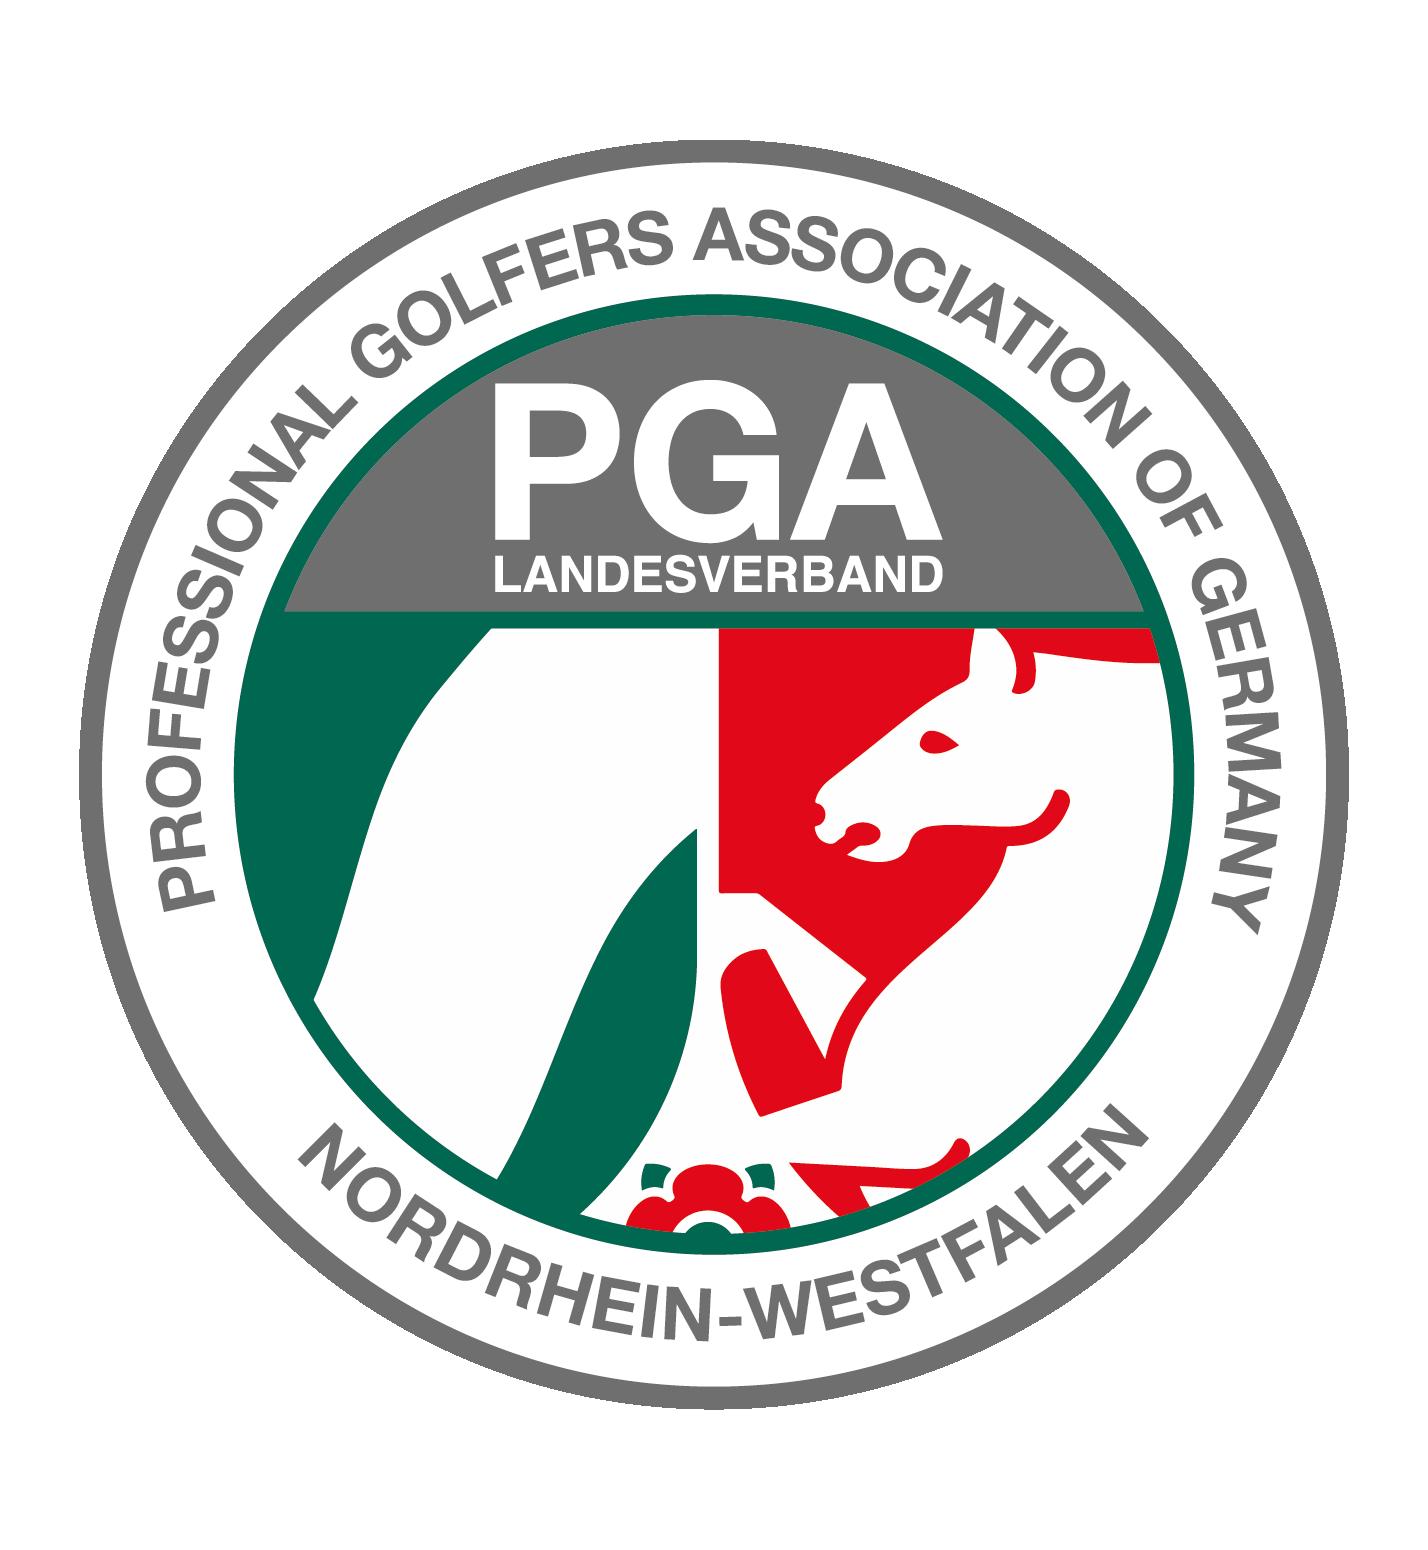 PGA Landesverband NRW Logo